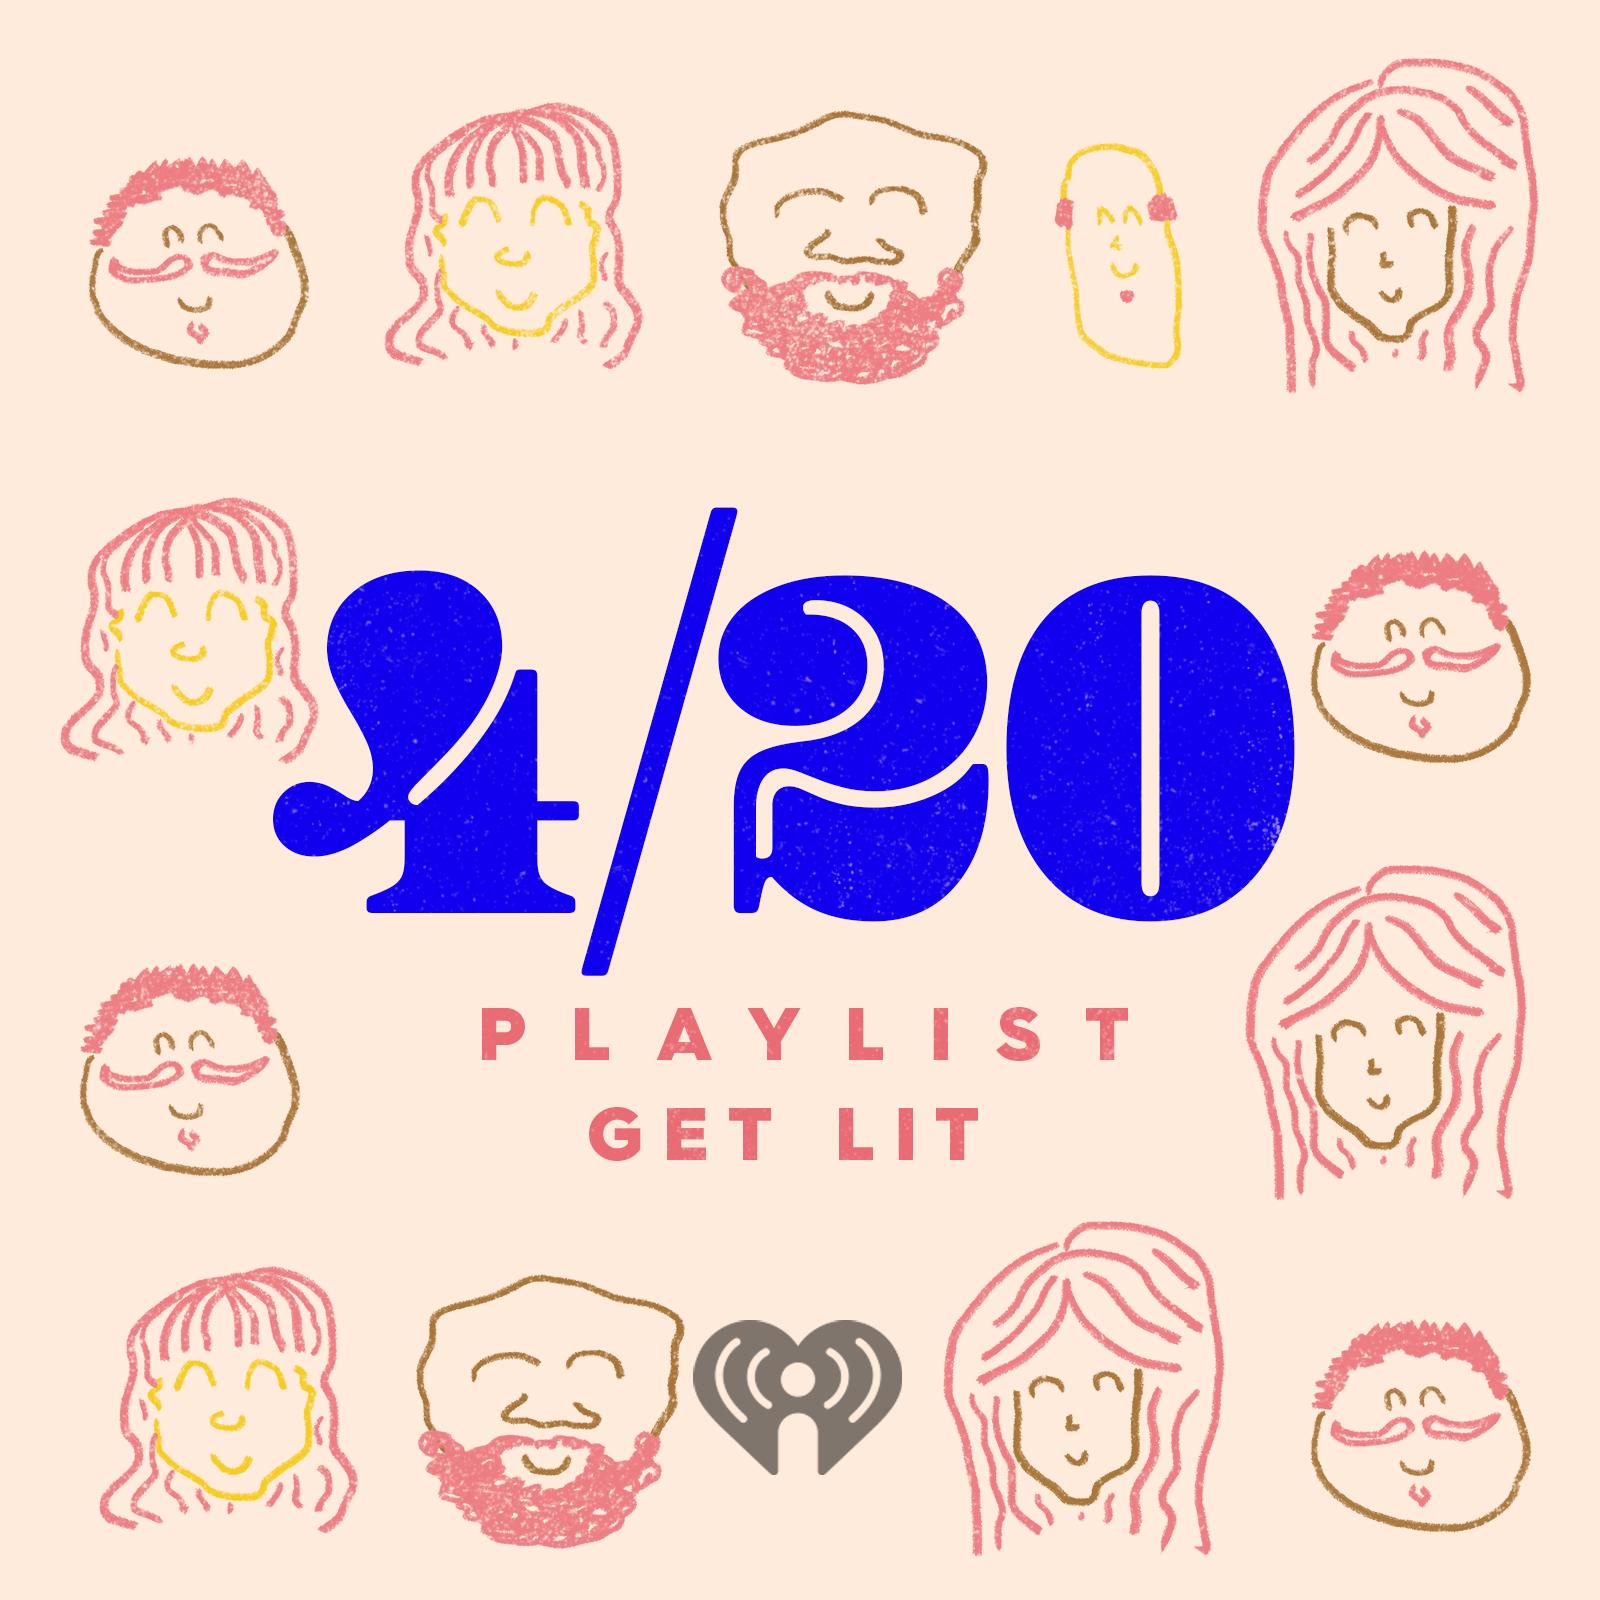 Playlist Covers Nickstola